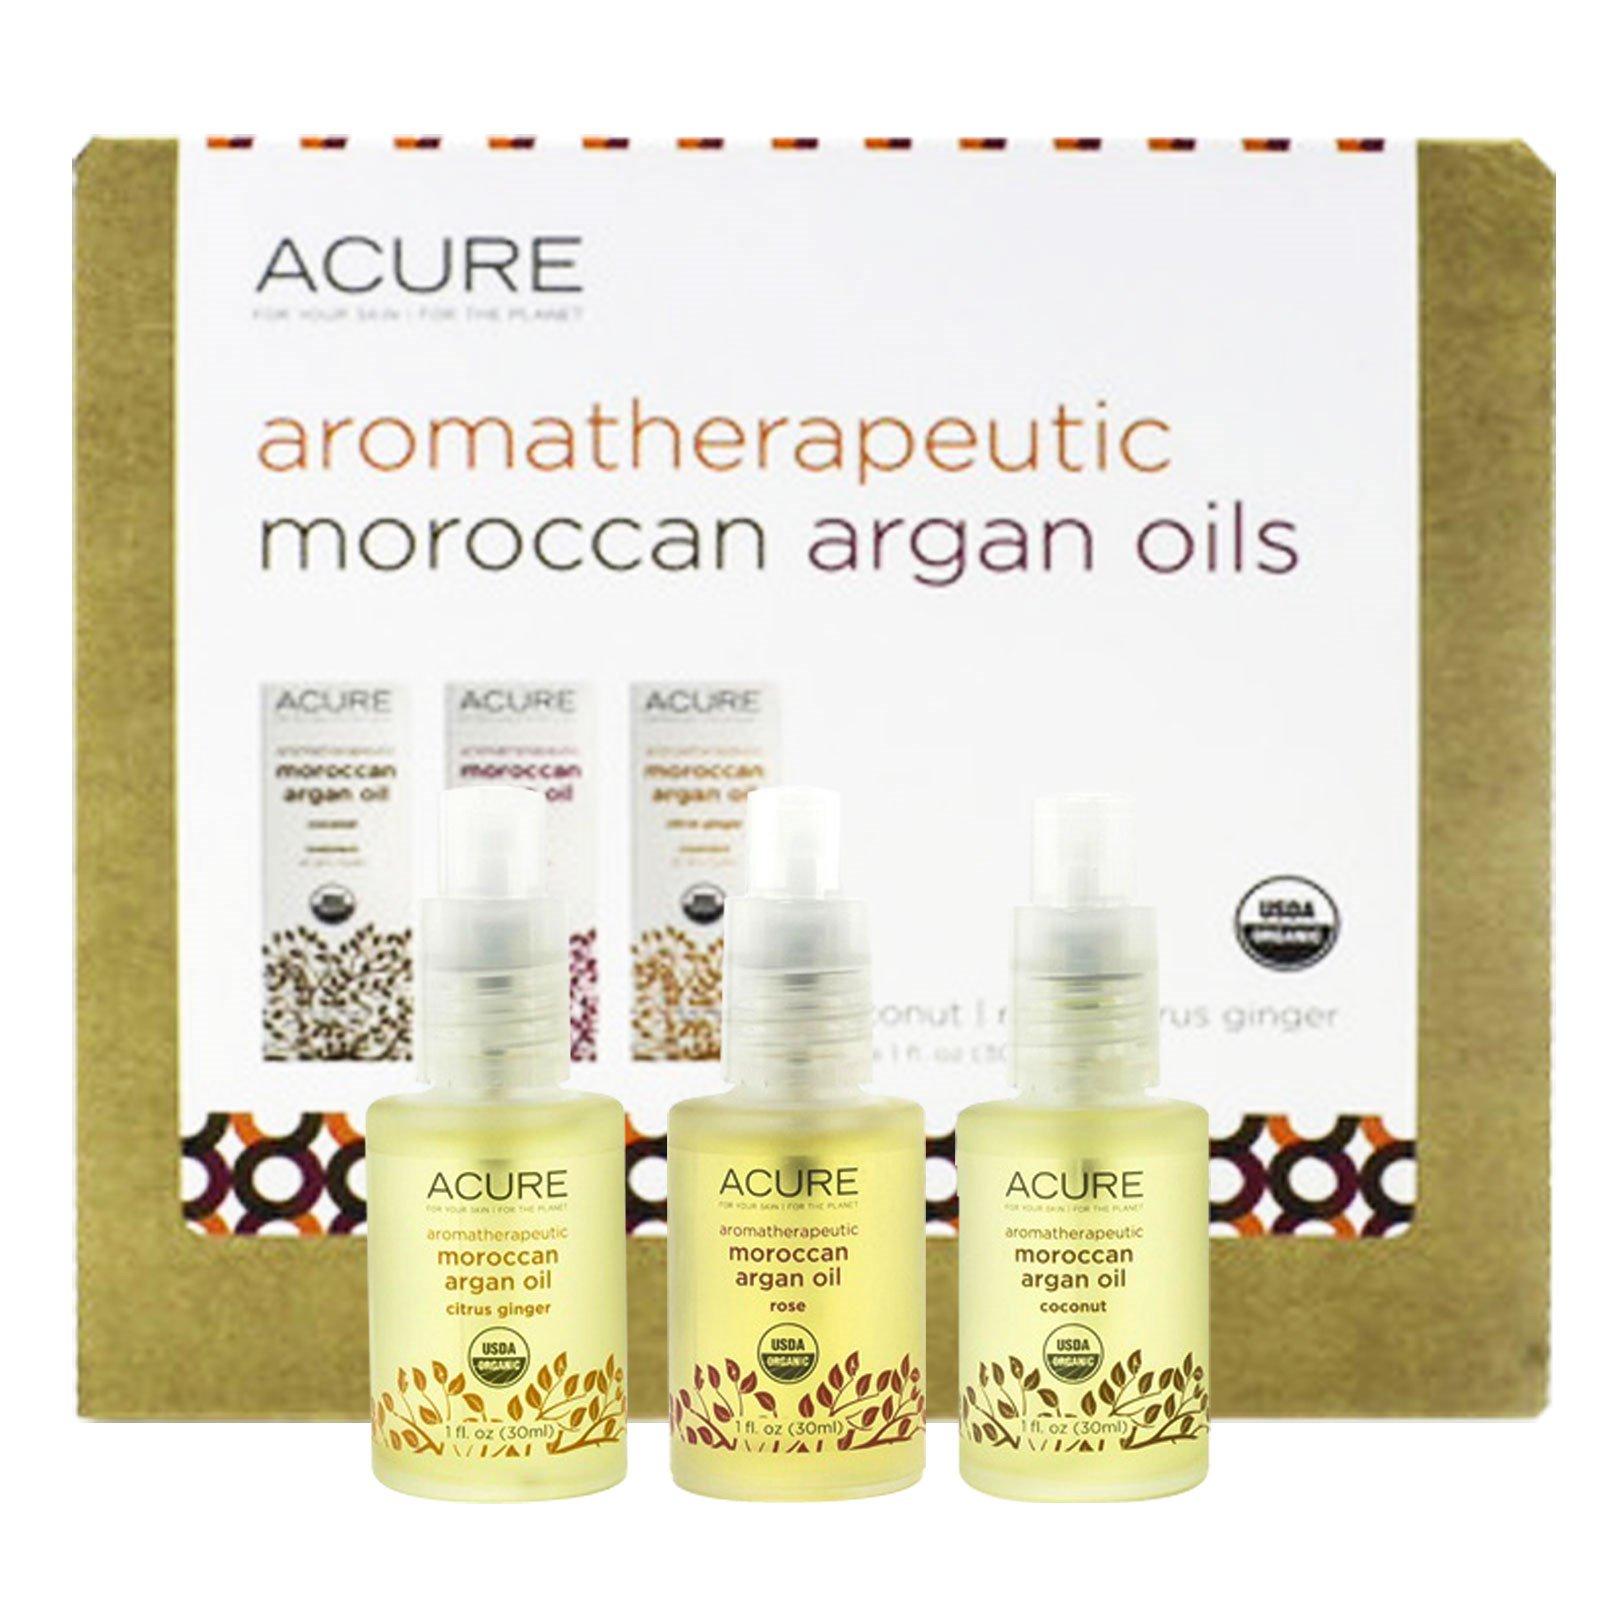 Acure, Aromatherapeutic Moroccan Argan Oils Trio Set